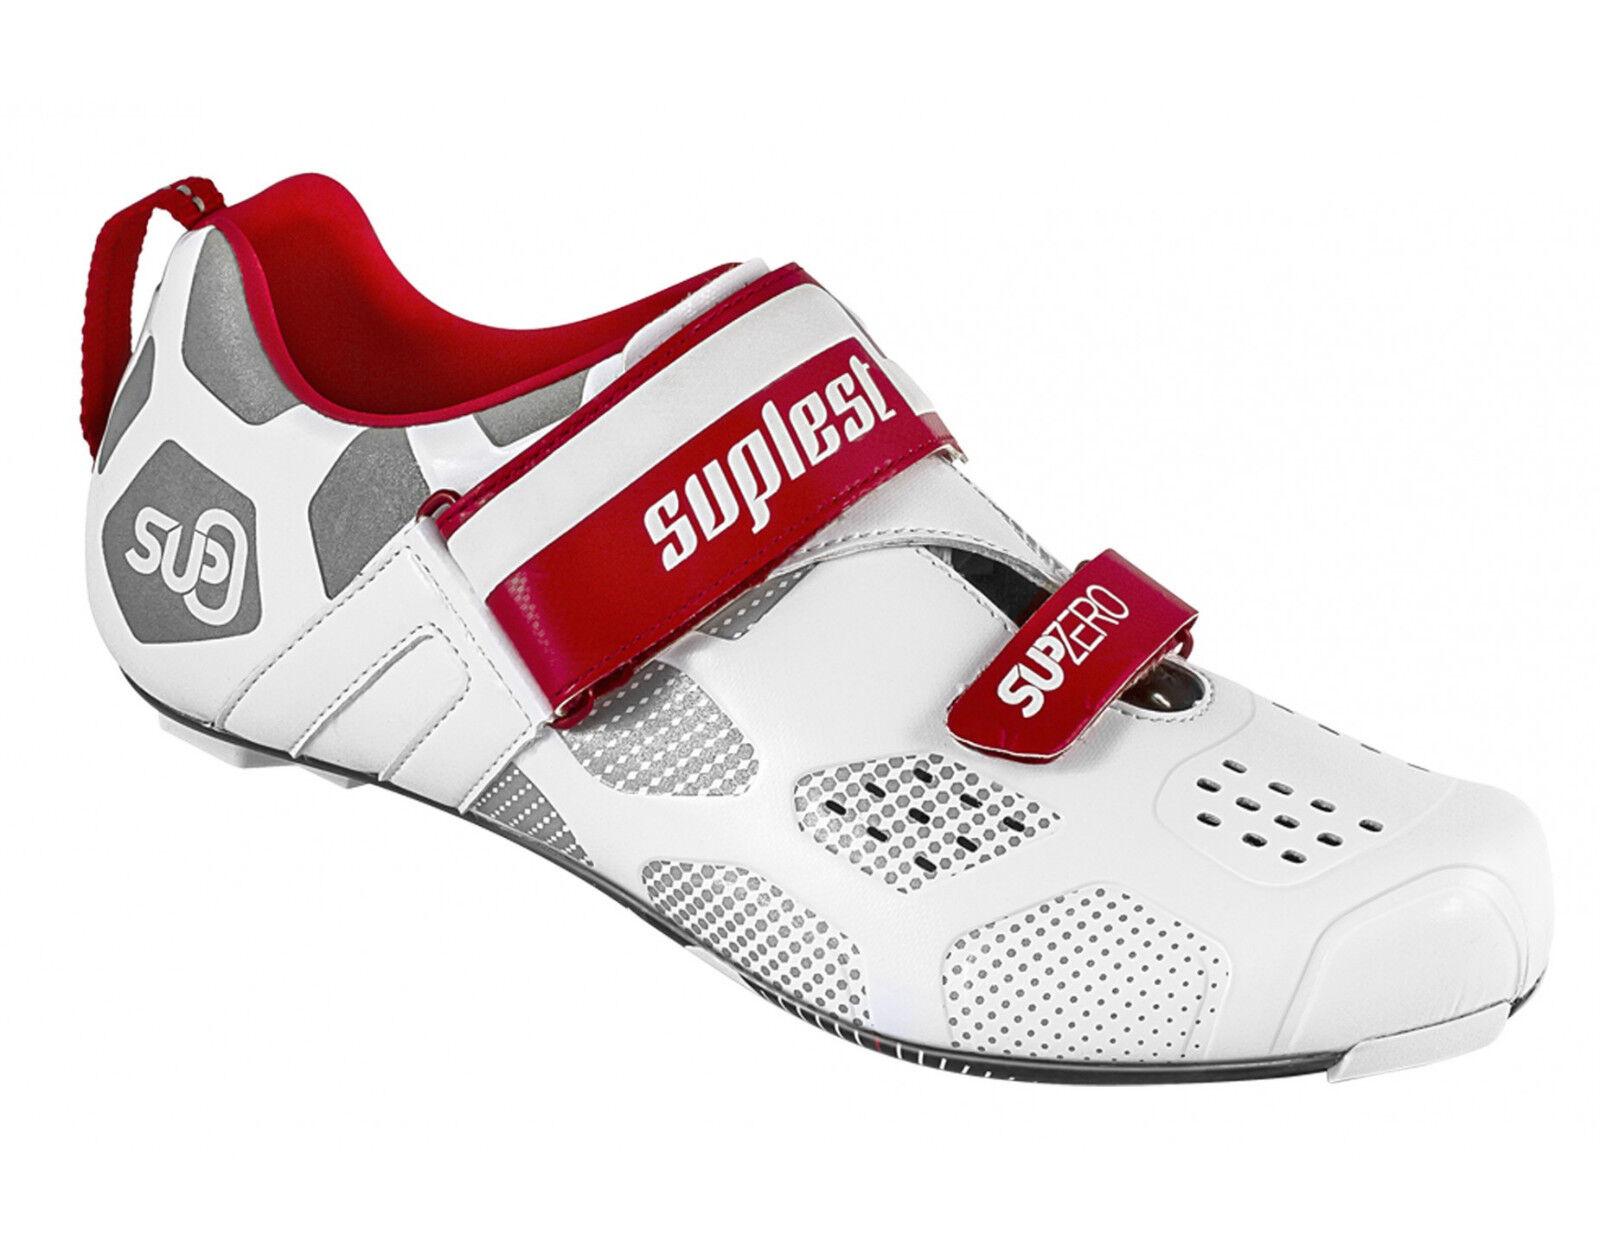 Suplest  Supzero Triathlon Carbon Triathlon shoes US 12 New  quality assurance